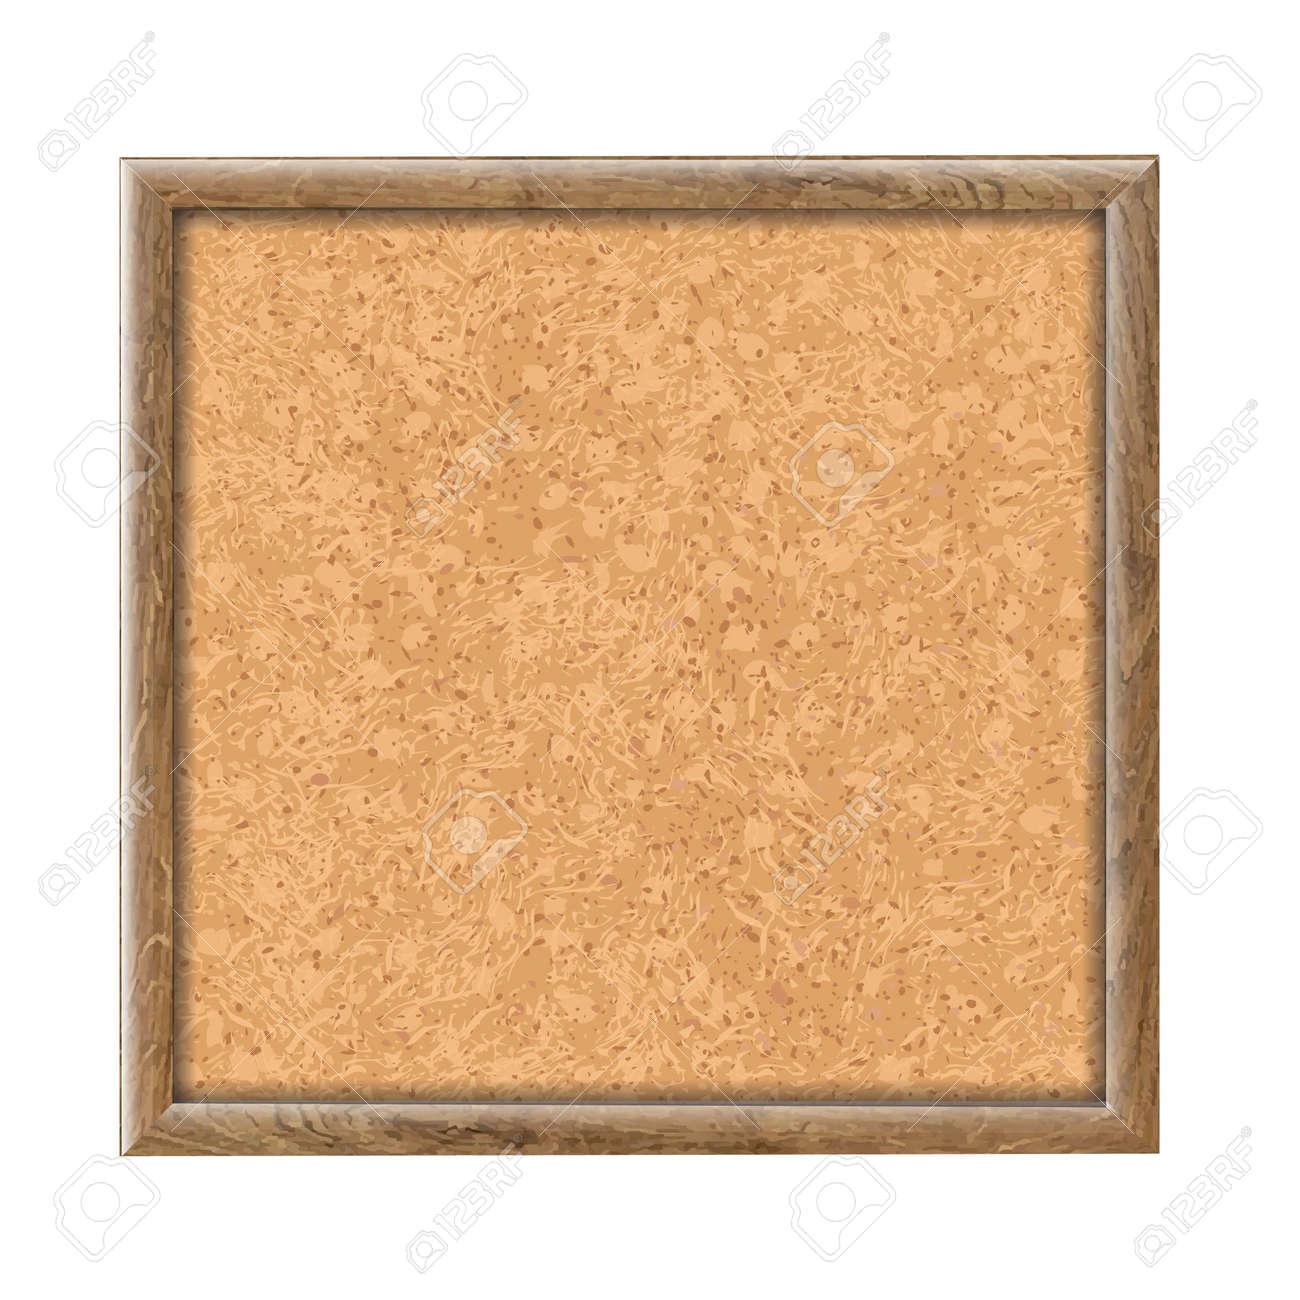 Cork Board Wooden Texture, Vector Illustration - 21902870